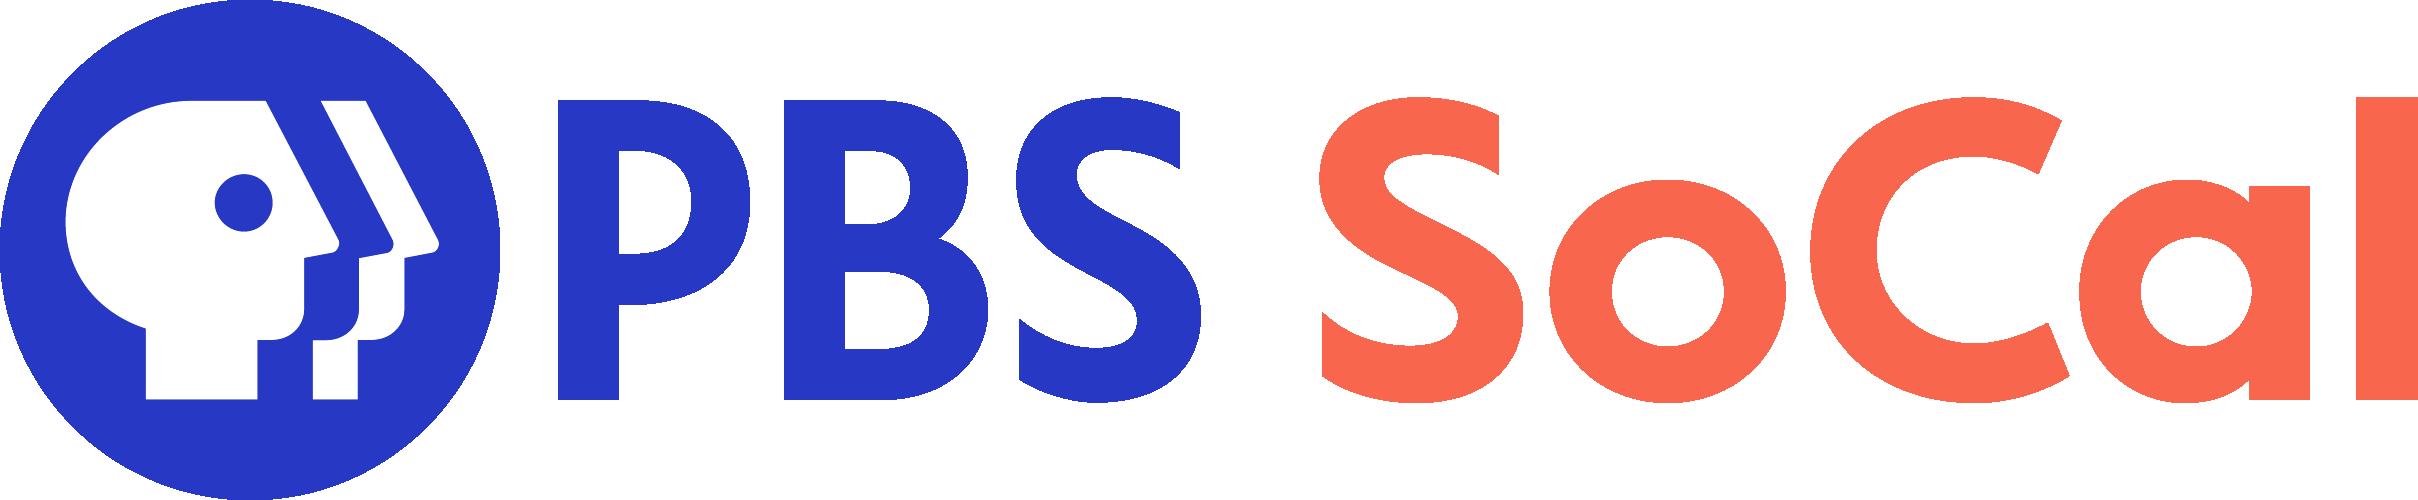 PBS SoCal | KCET